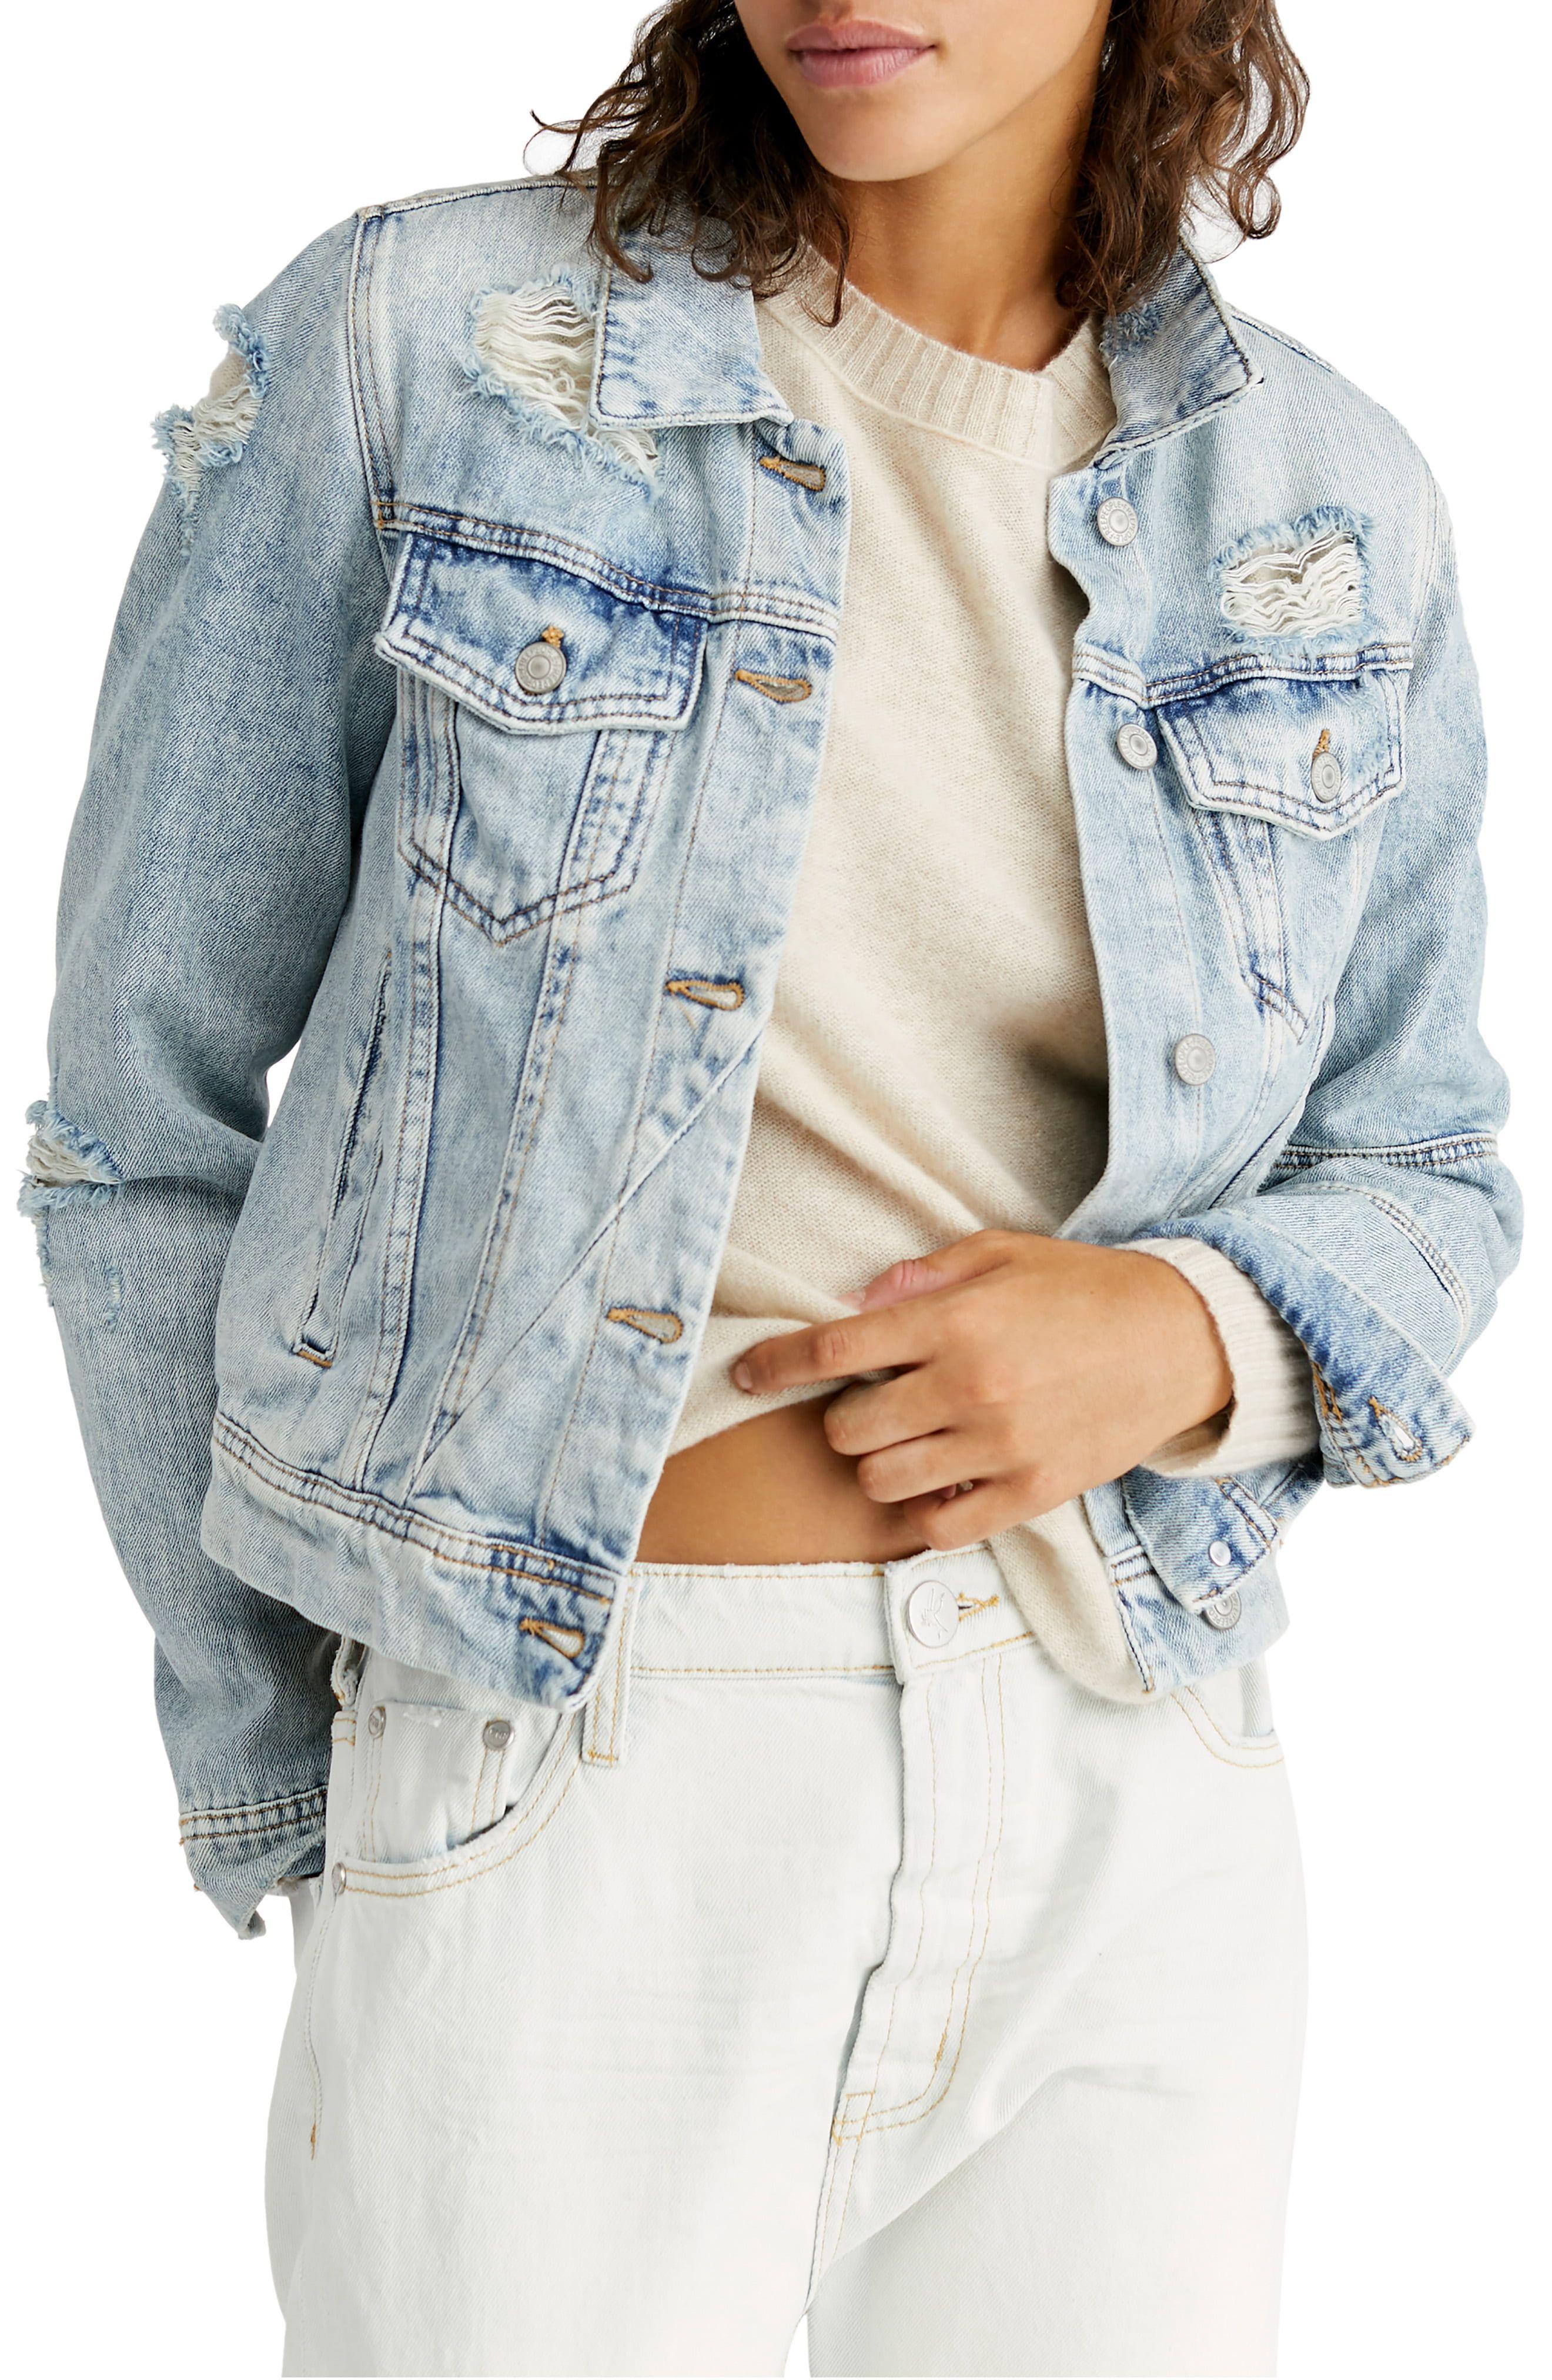 Free People Rumors Ripped Denim Jacket Nordstrom In 2021 Denim Jacket Women Light Denim Jacket Denim Jacket [ 4048 x 2640 Pixel ]